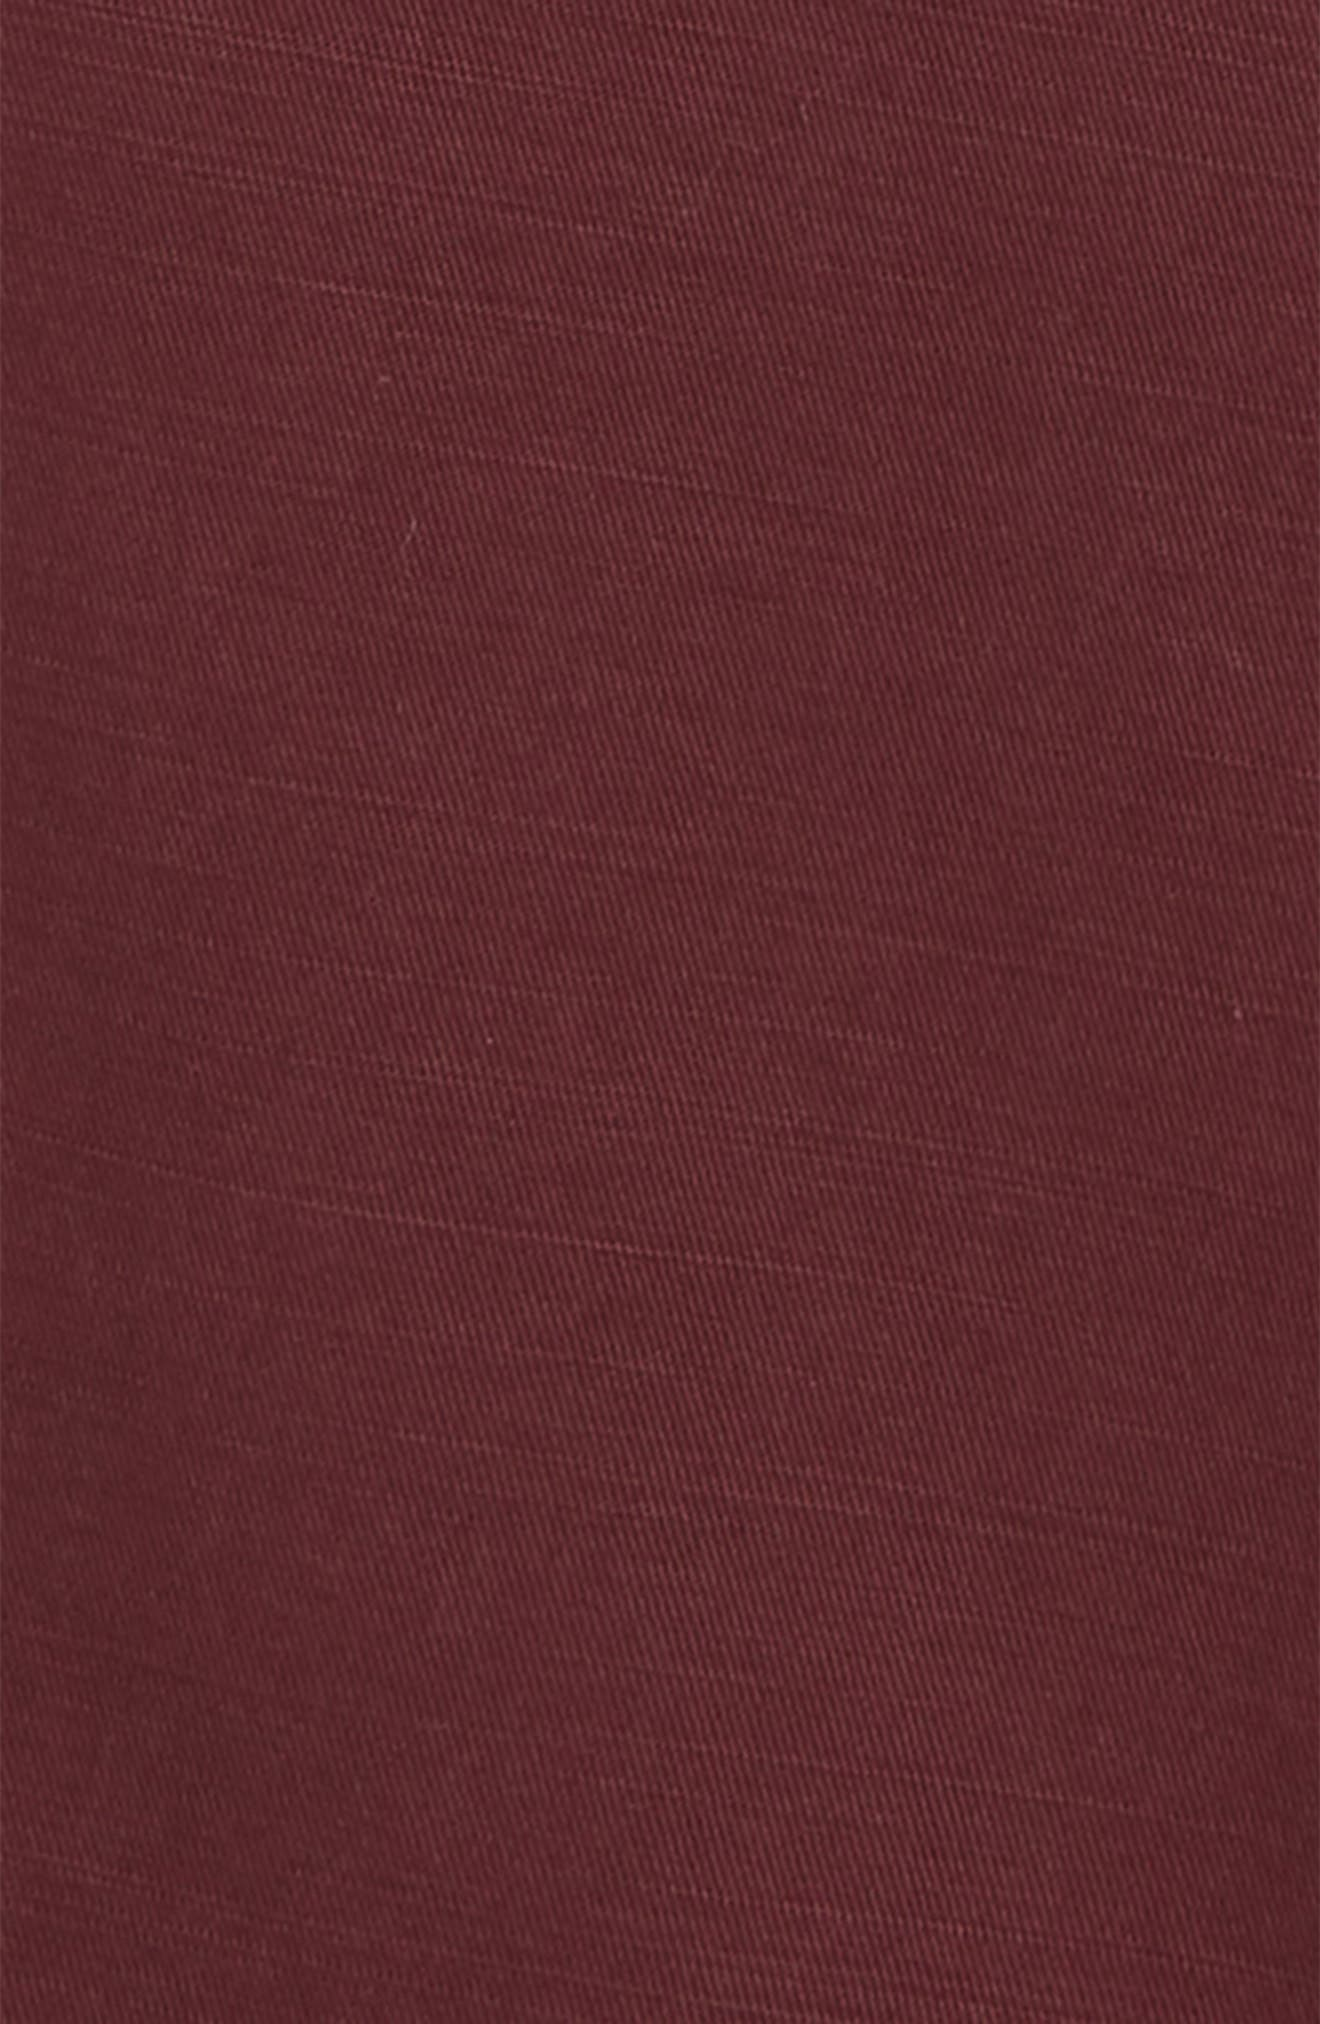 Jay Chino Shorts,                             Alternate thumbnail 2, color,                             WINE